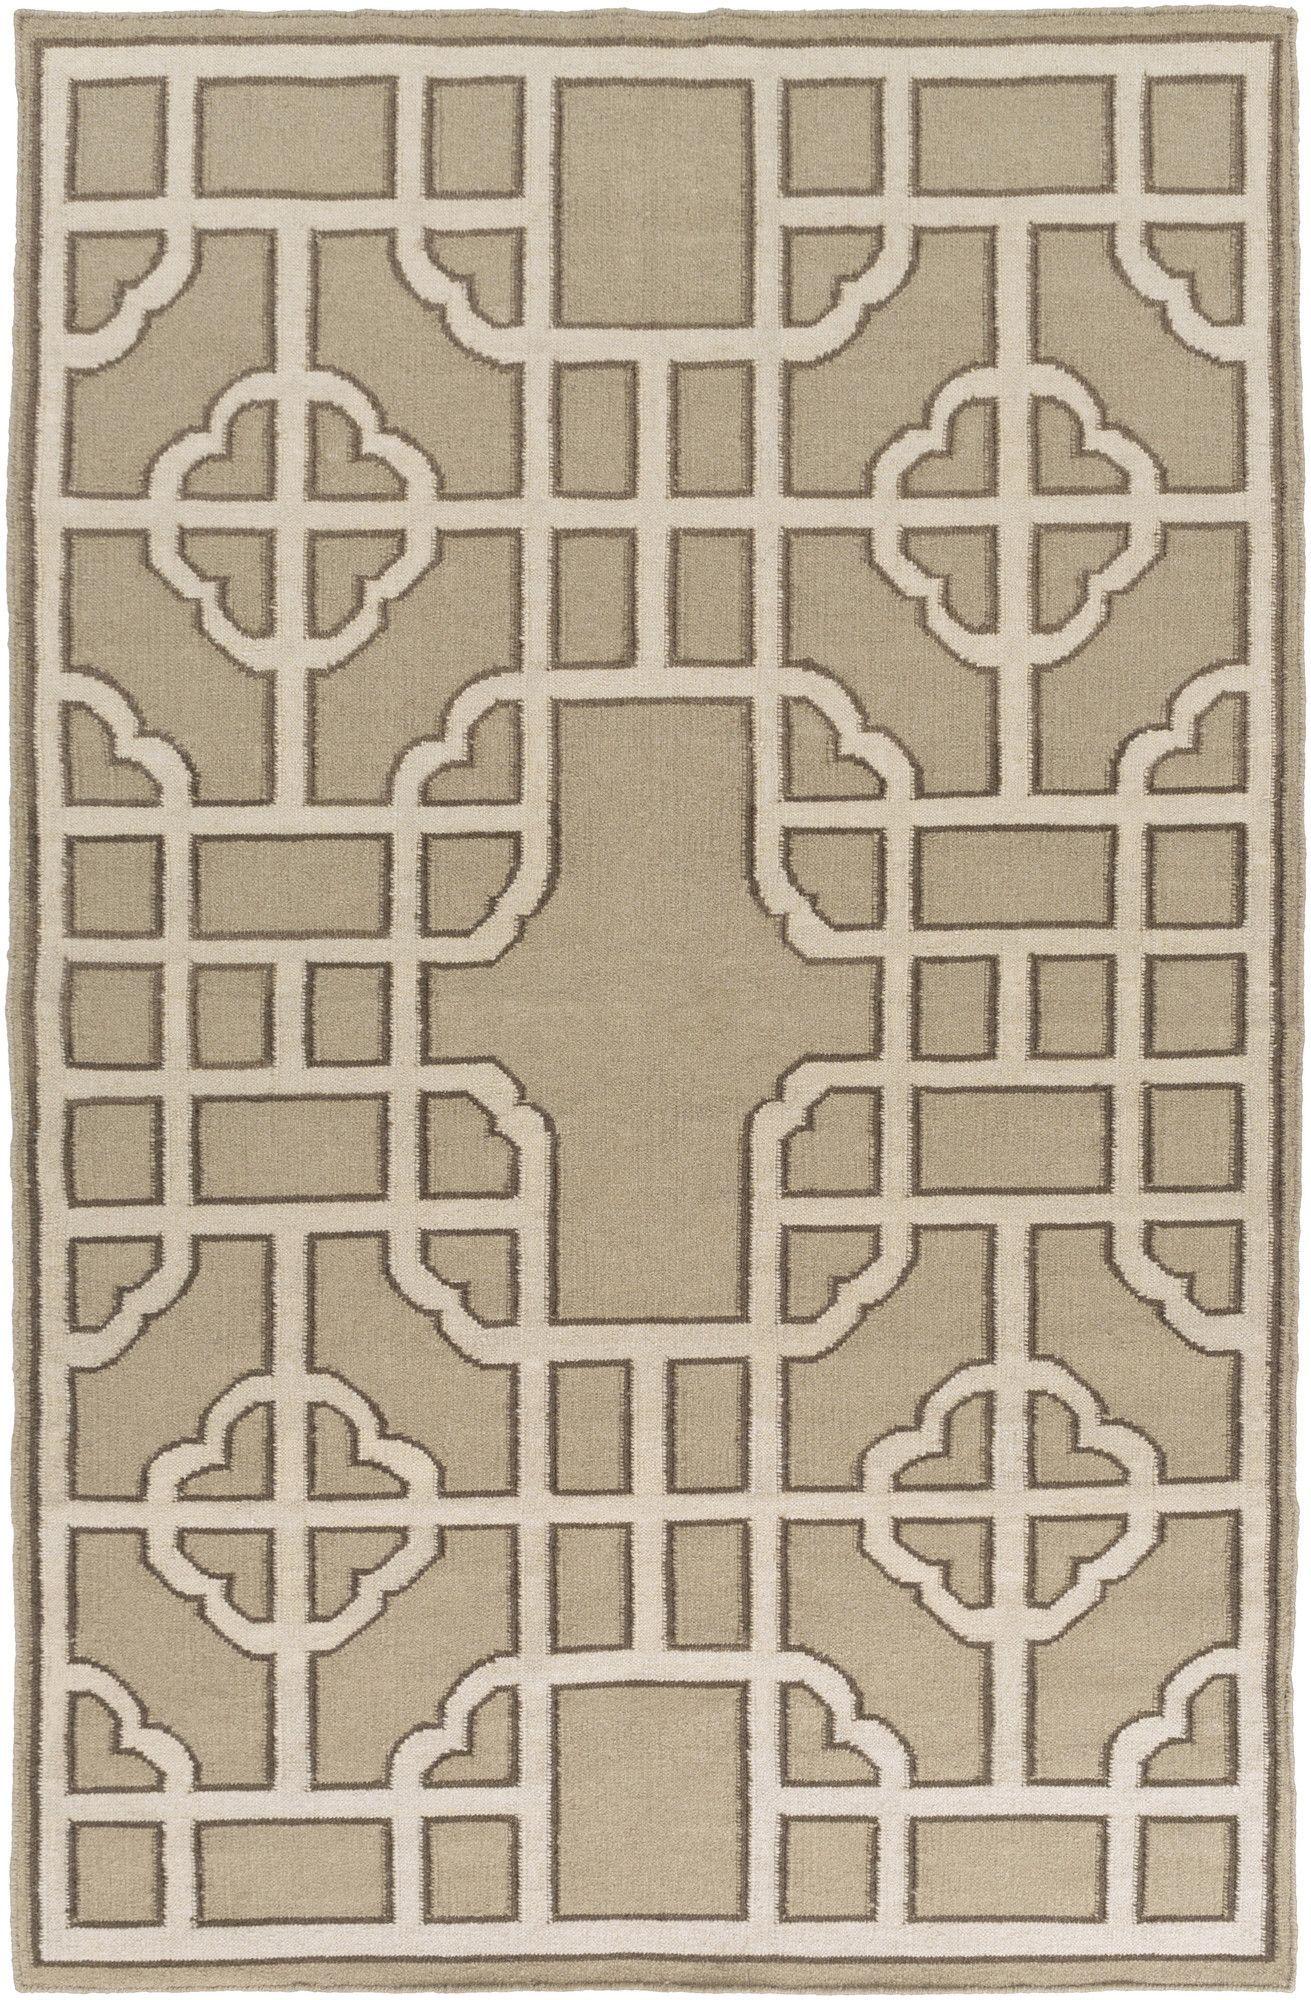 Alameda Beige/Taupe Geometric Area Rug